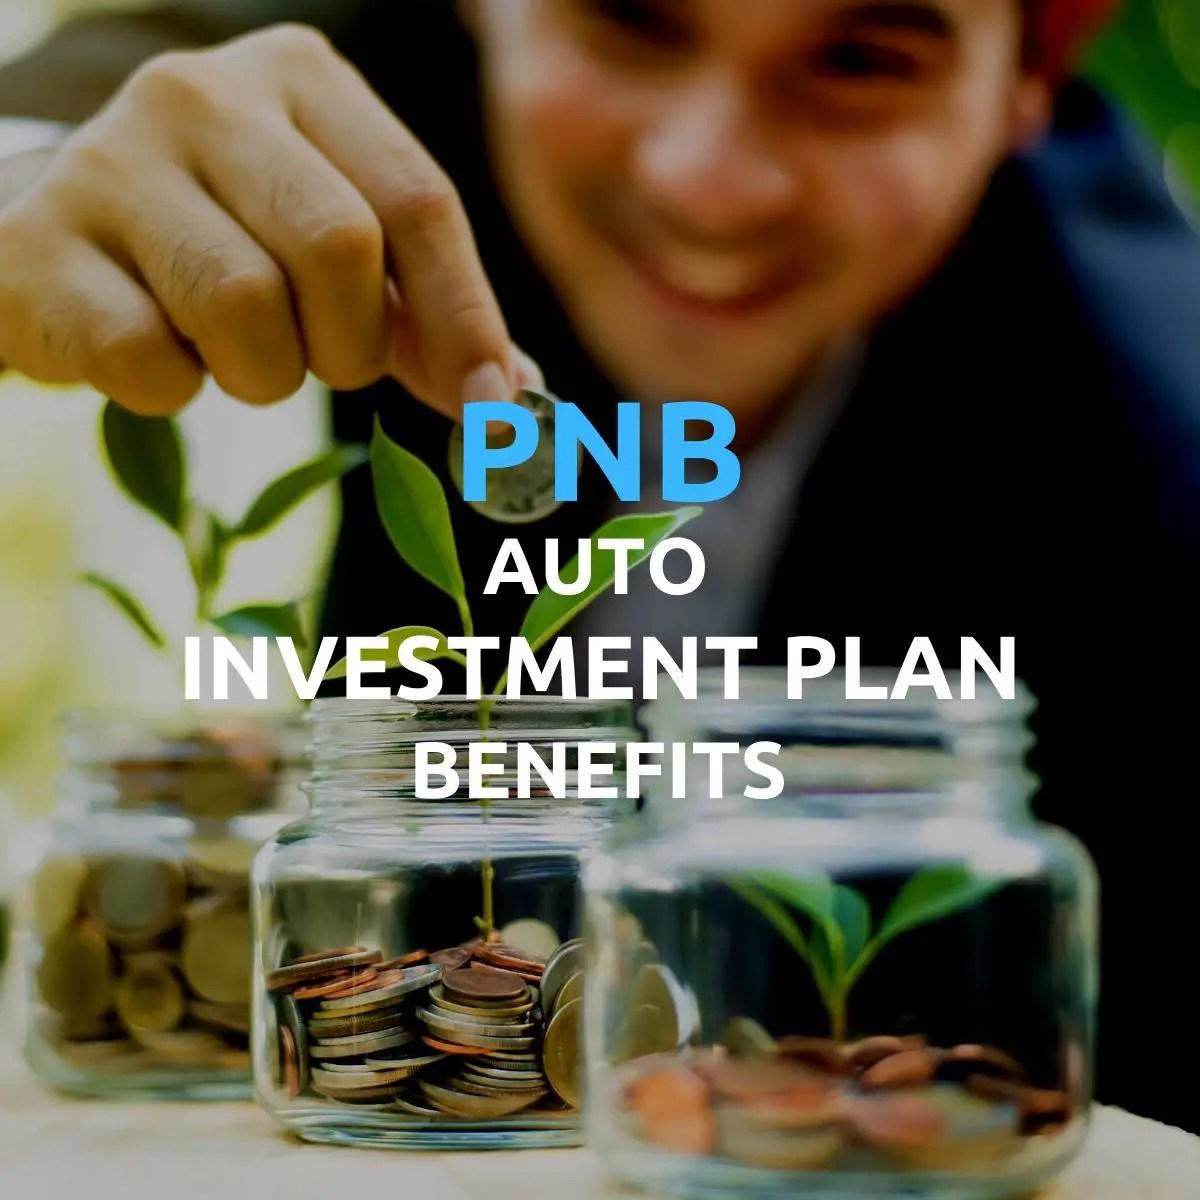 pnb auto investment plan uitf benefits